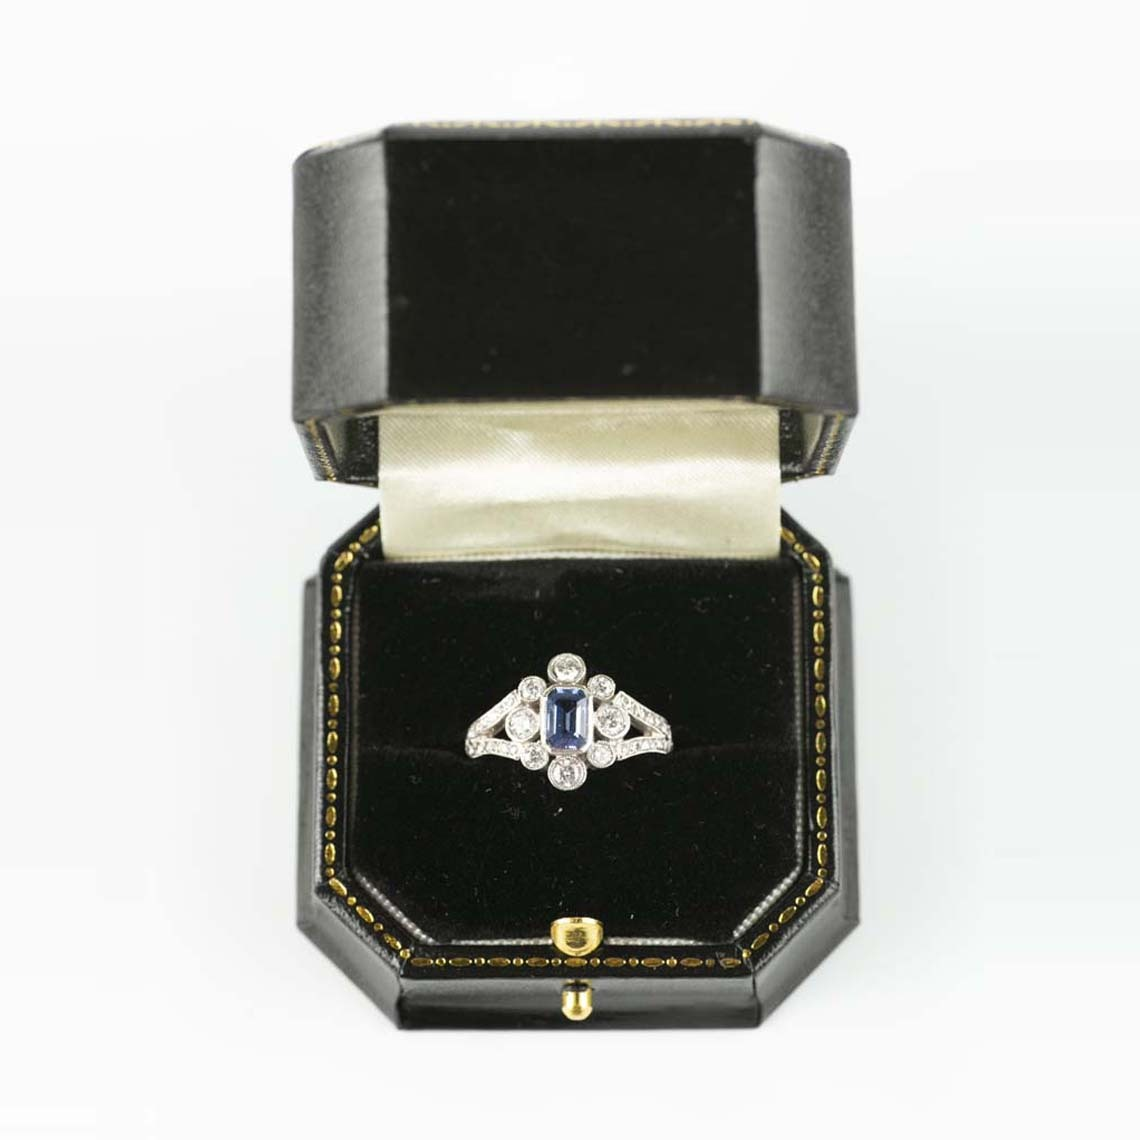 Vintage diamond and sapphire ring